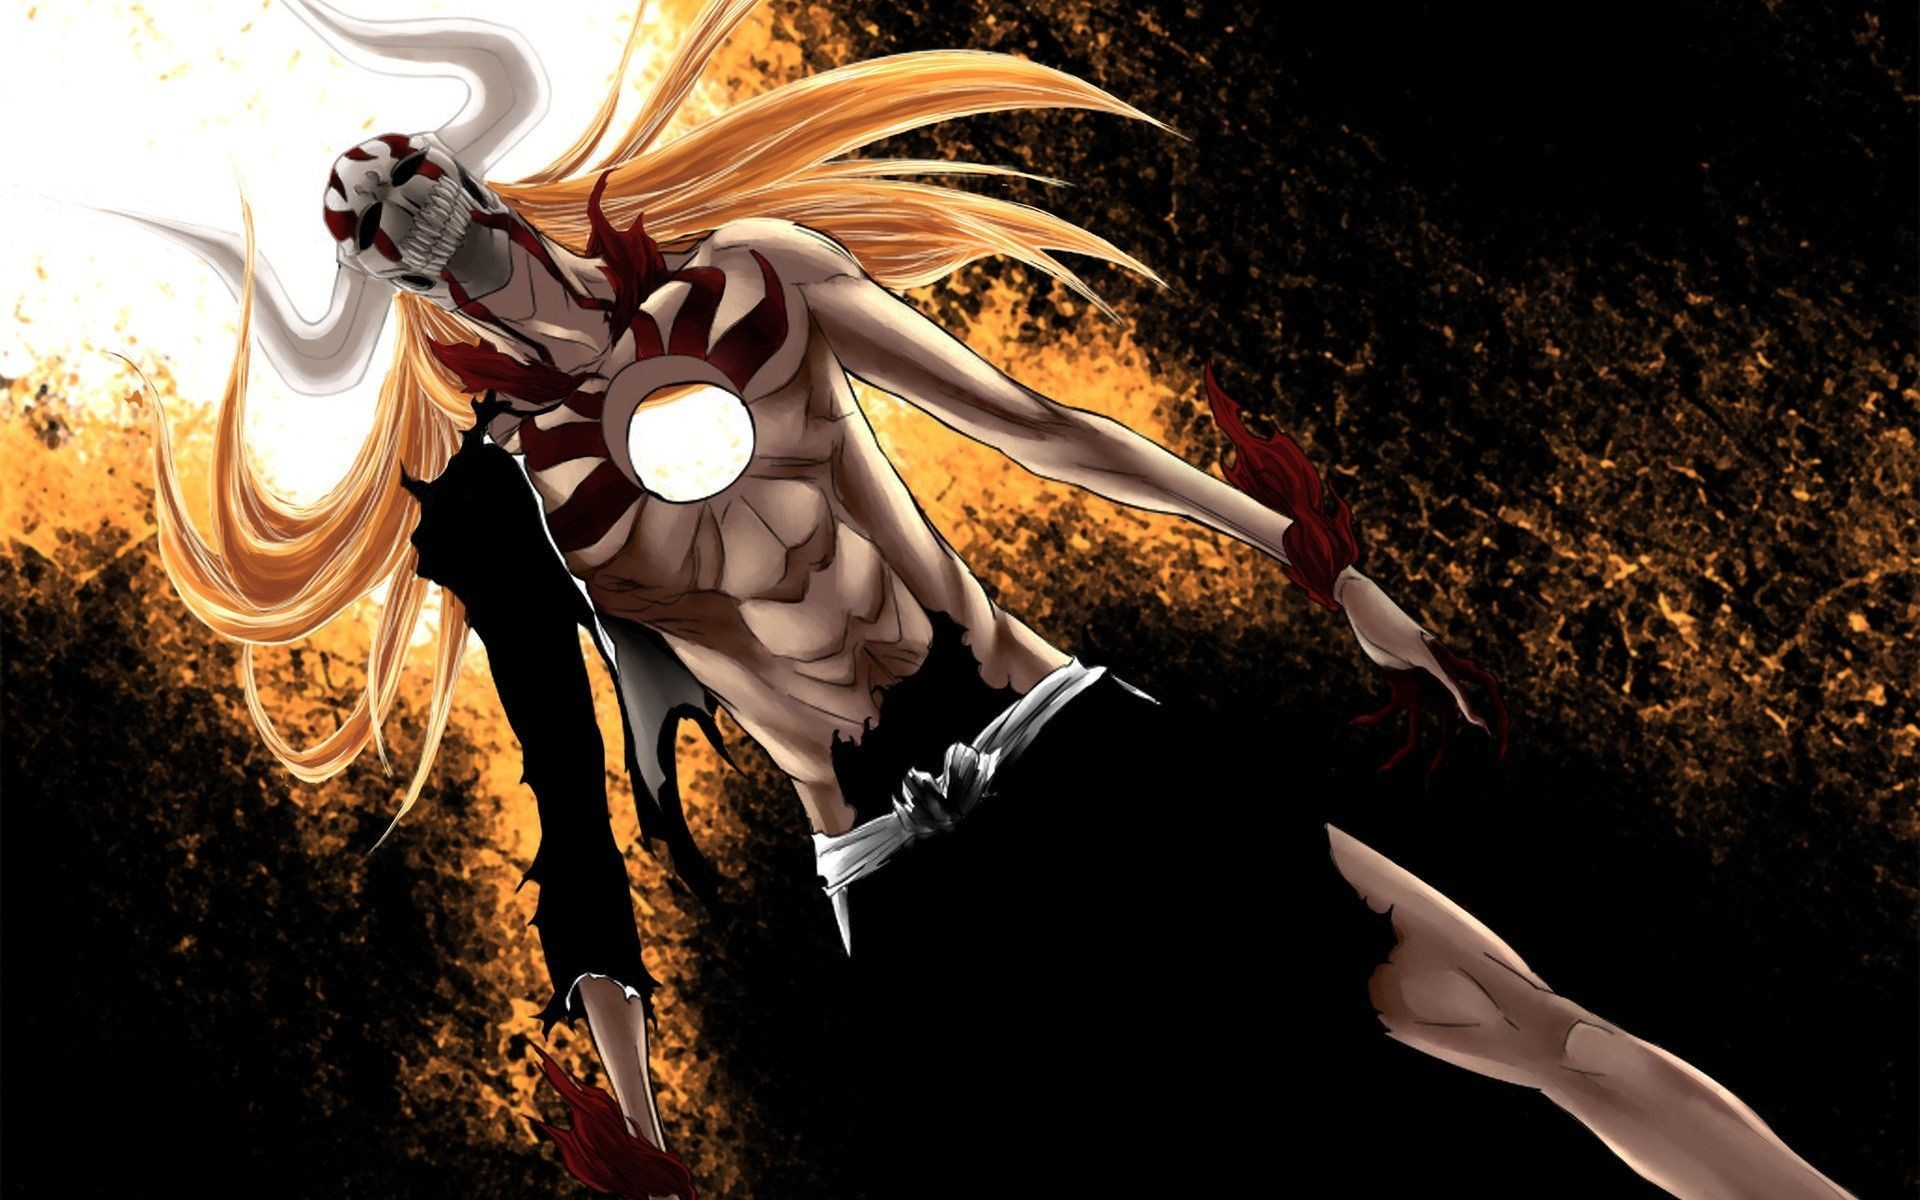 Ichigo Bleach Wallpaper Manga Anime – 1651093